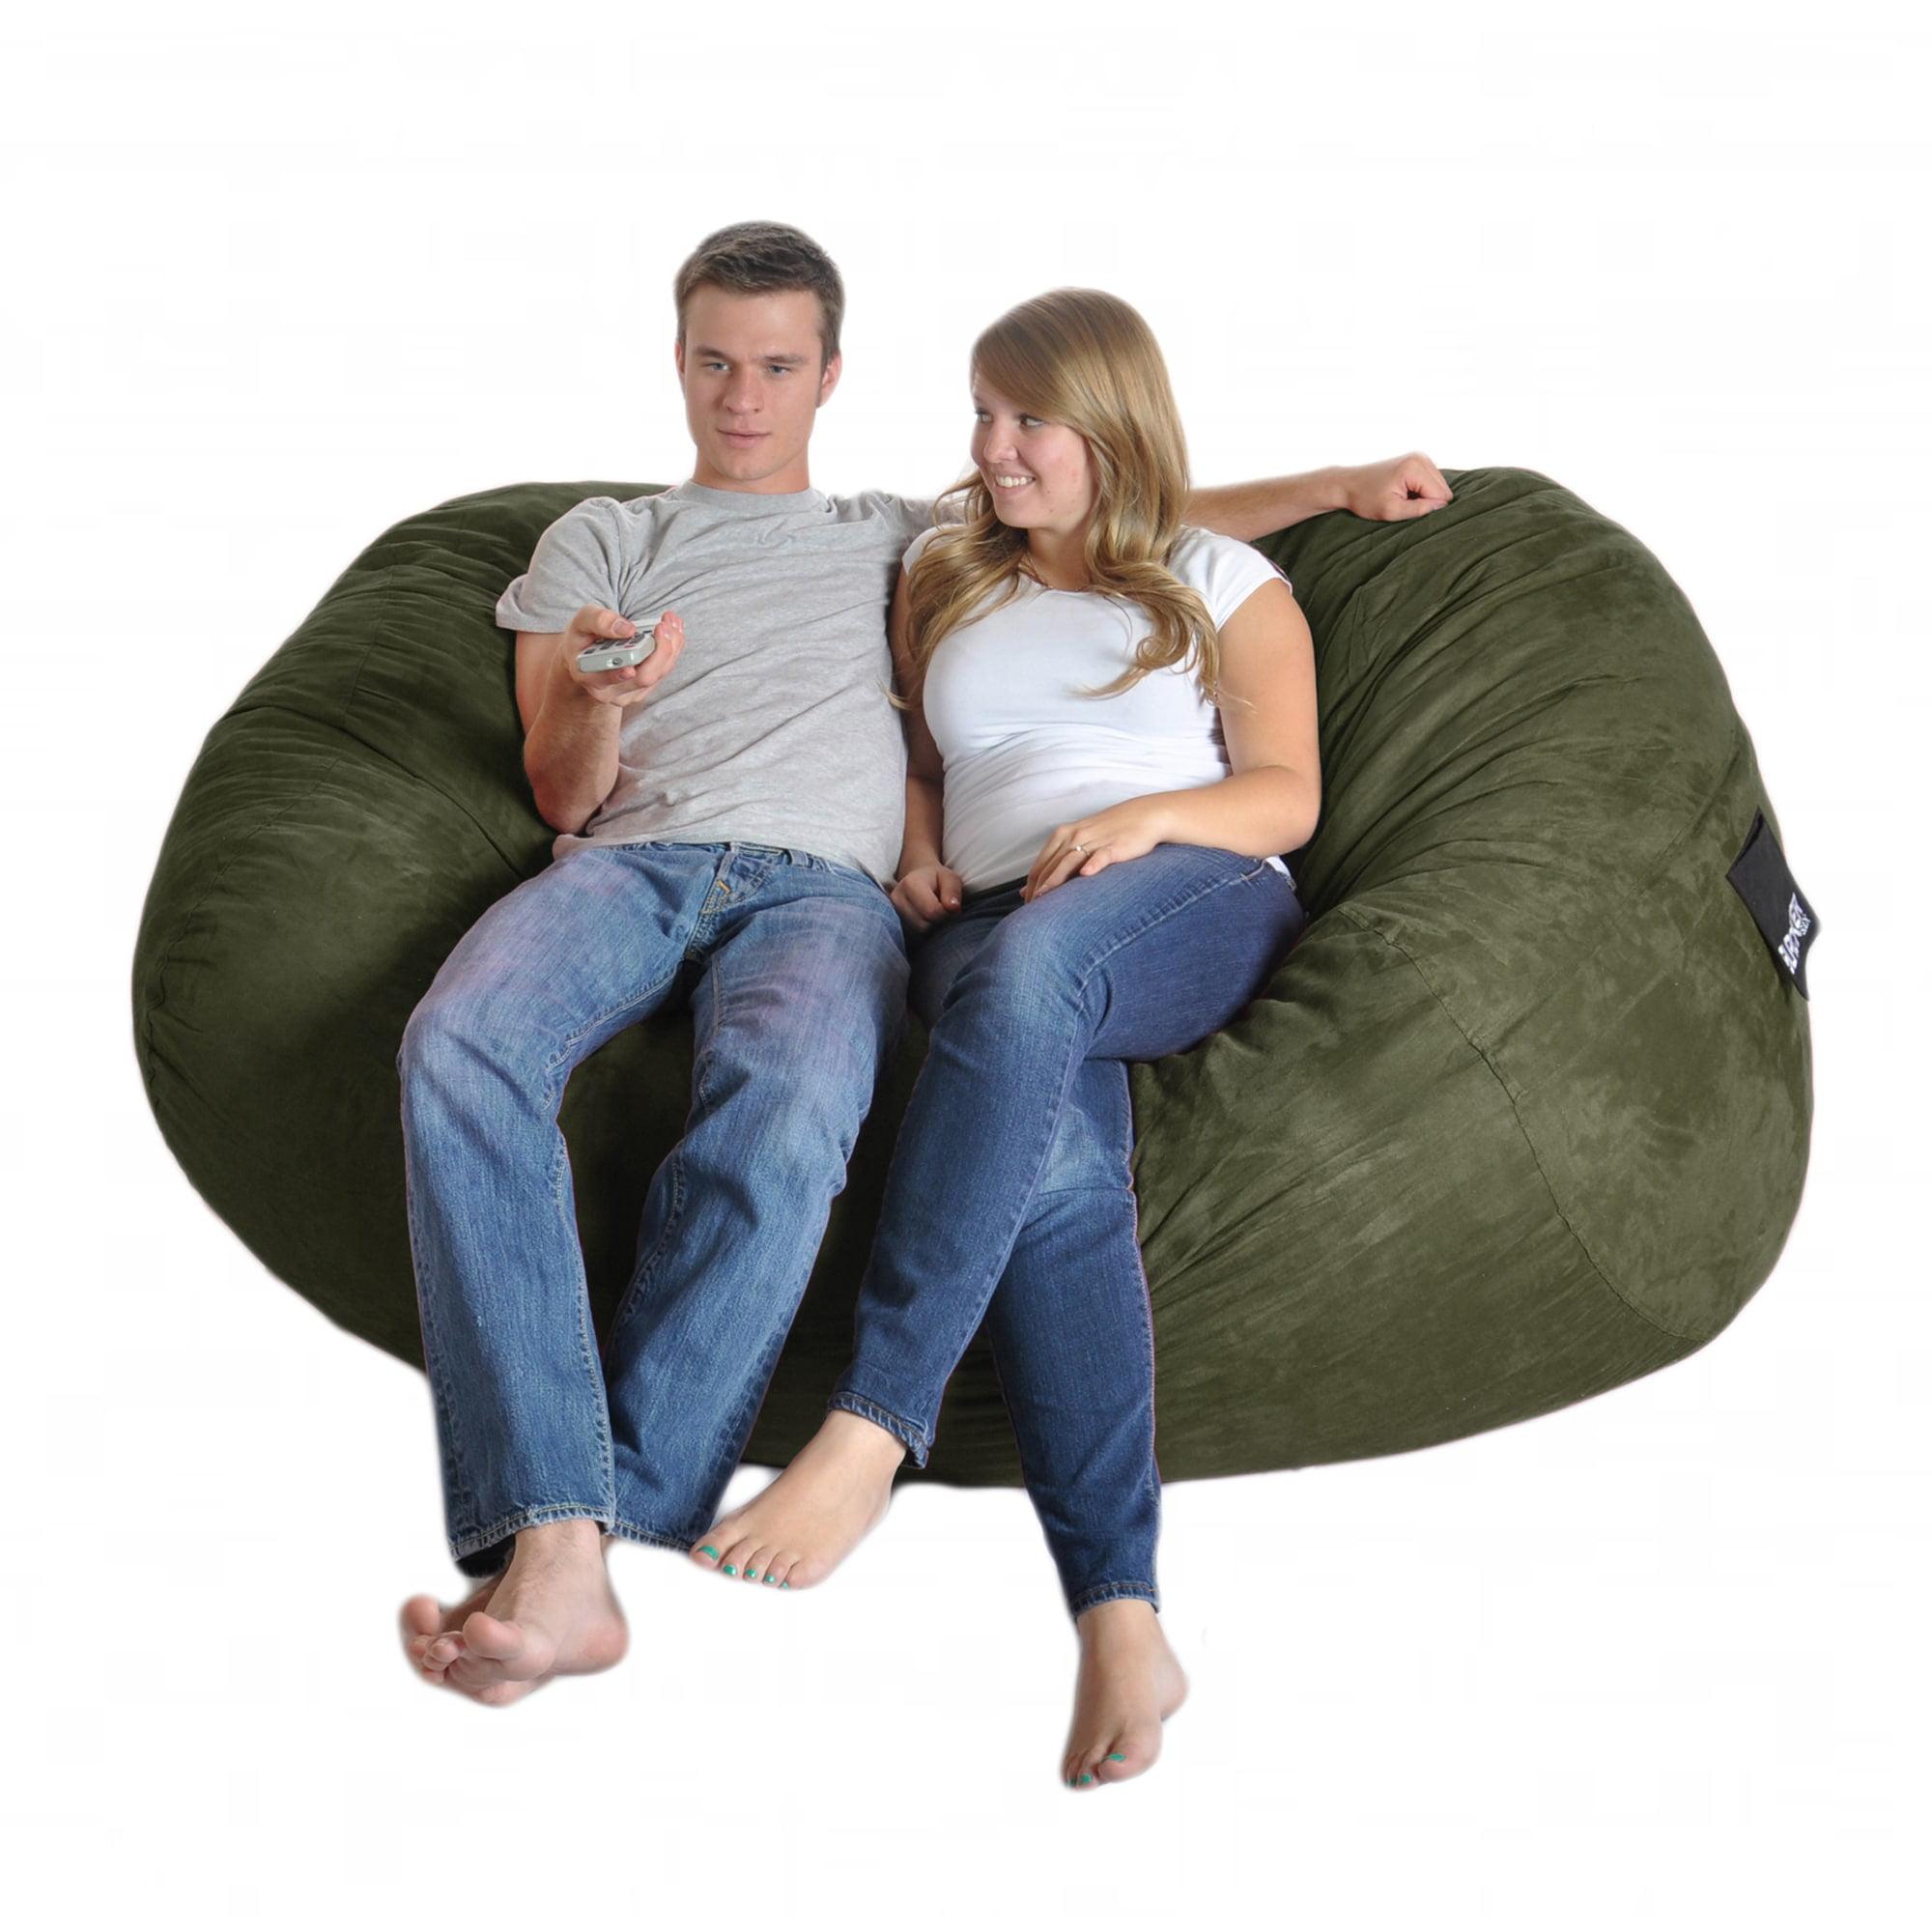 Slacker Sack Six-foot Oval Olive Green Microfiber and Foam Bean Bag